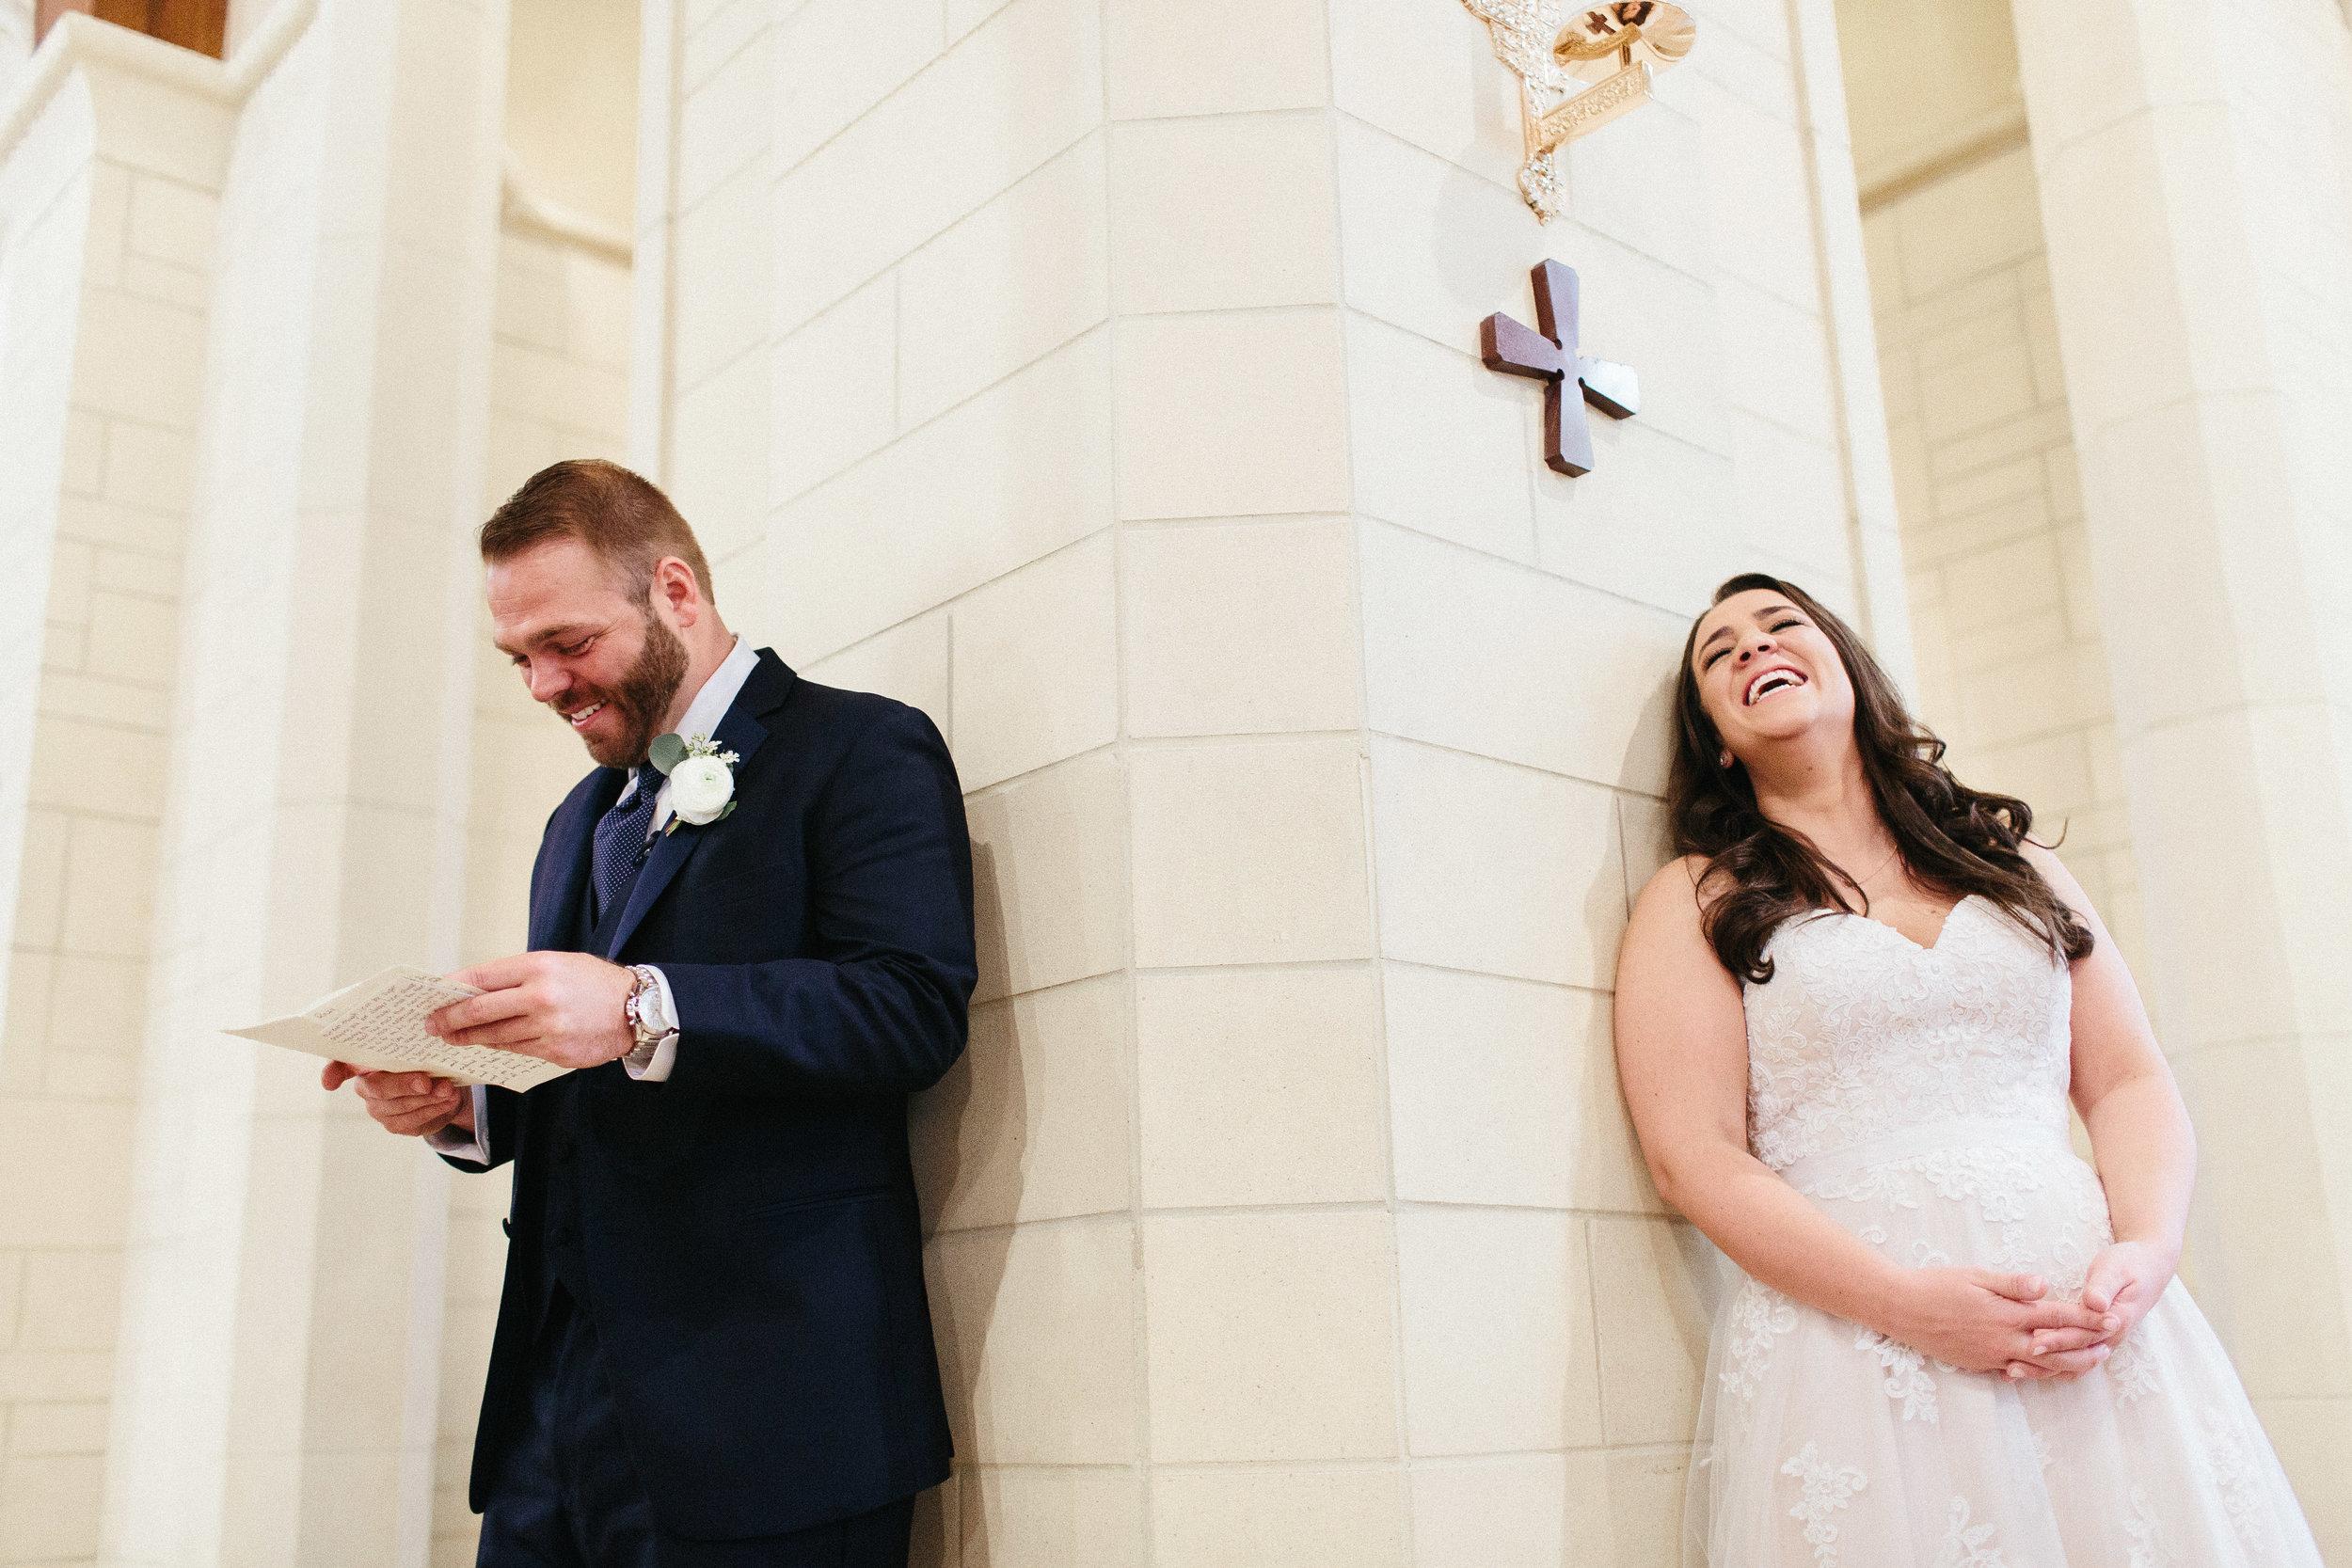 roswell_st_peter_chanel_catholic_avalon_hotel_alpharetta_wedding-1229.jpg